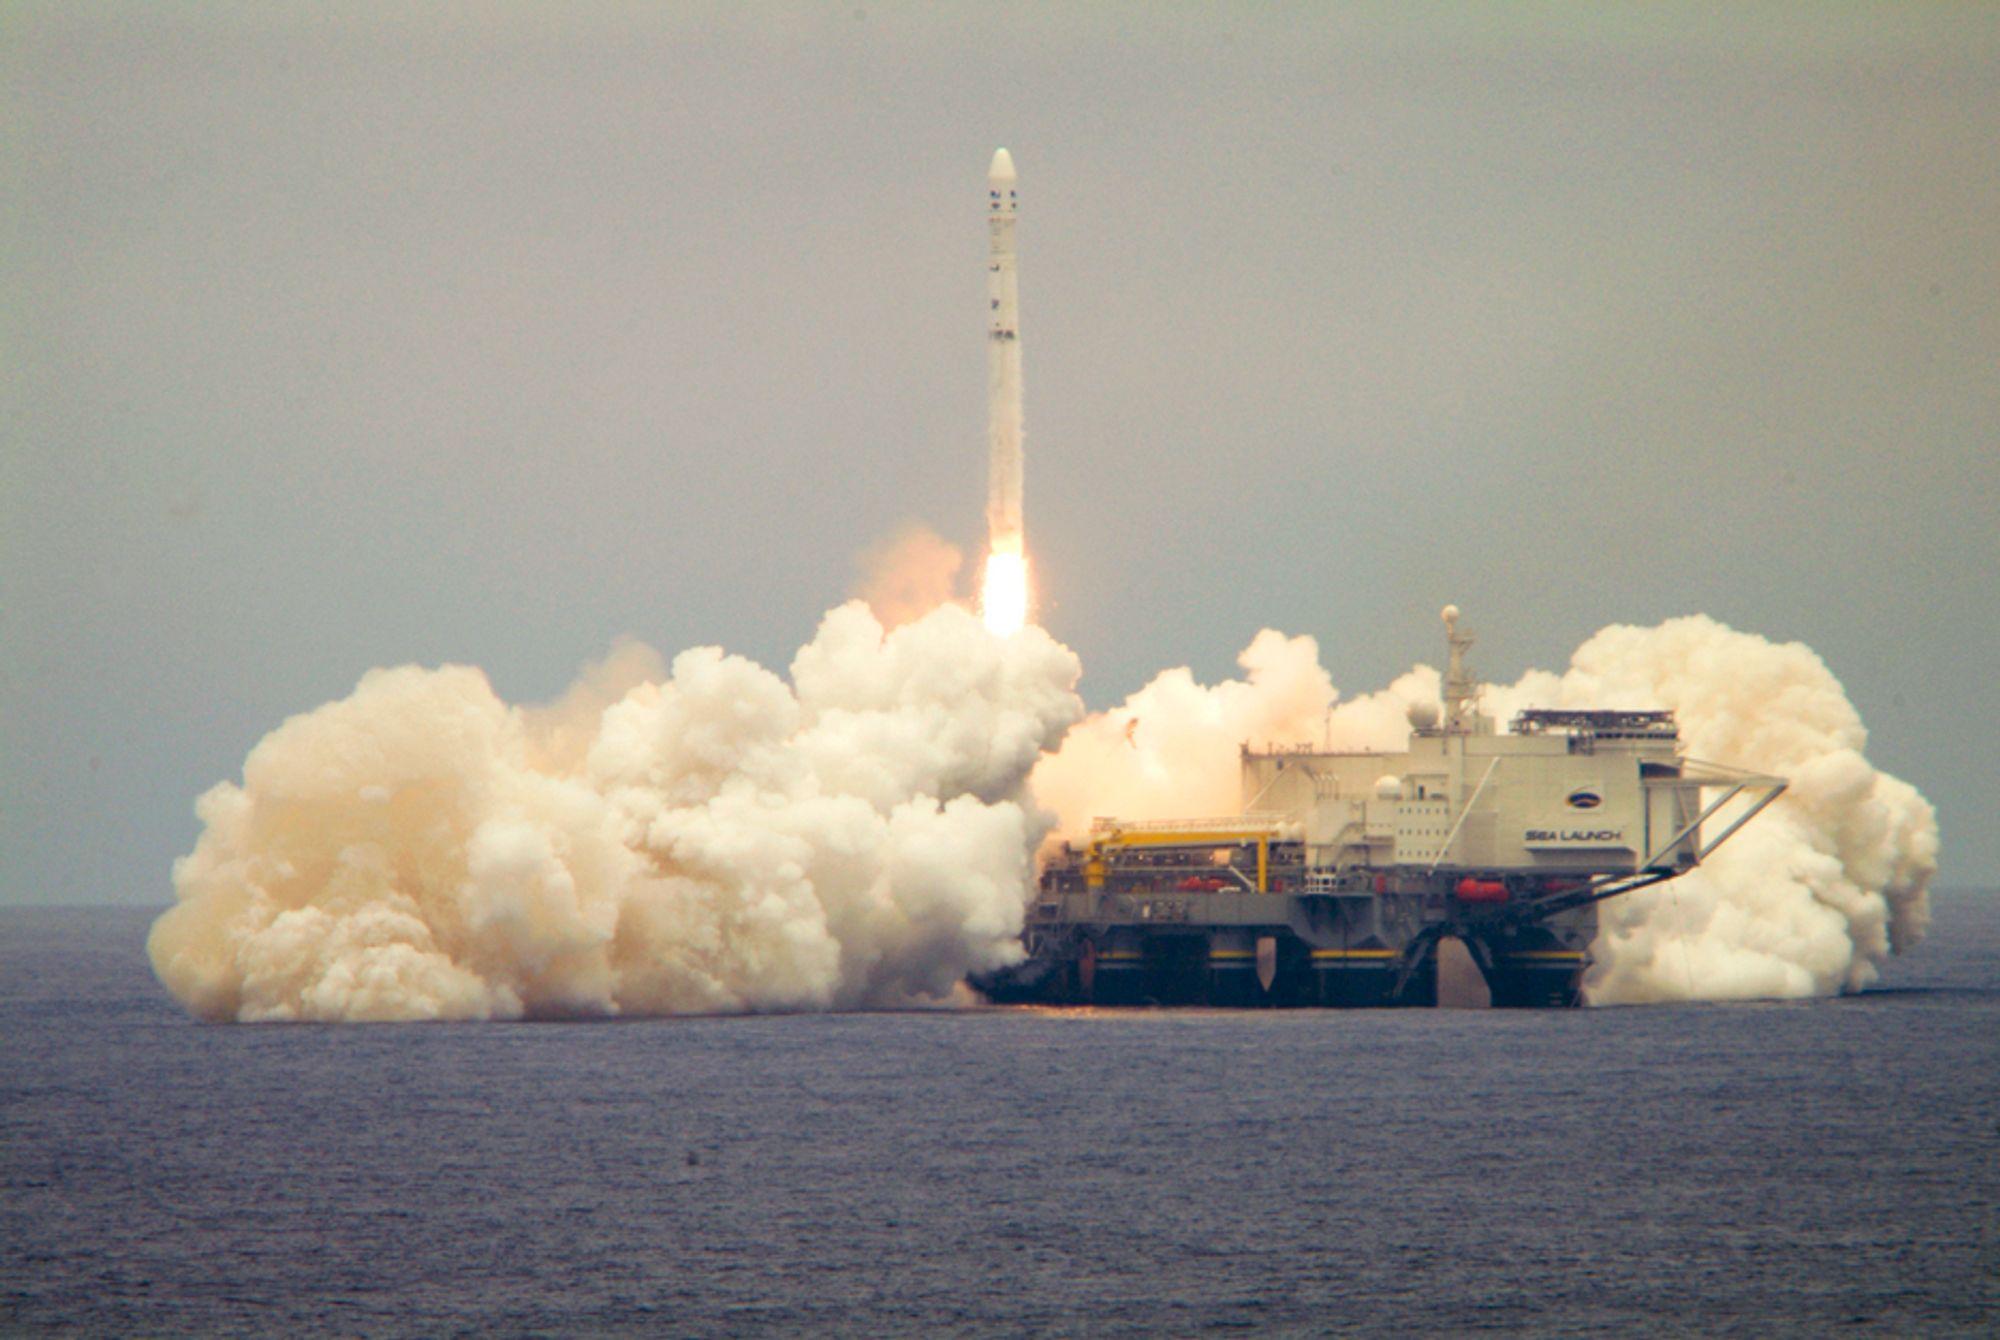 Sea Launch er i pengetrøbbel og har bedt om kreditorbeskyttelse, melder Aker.